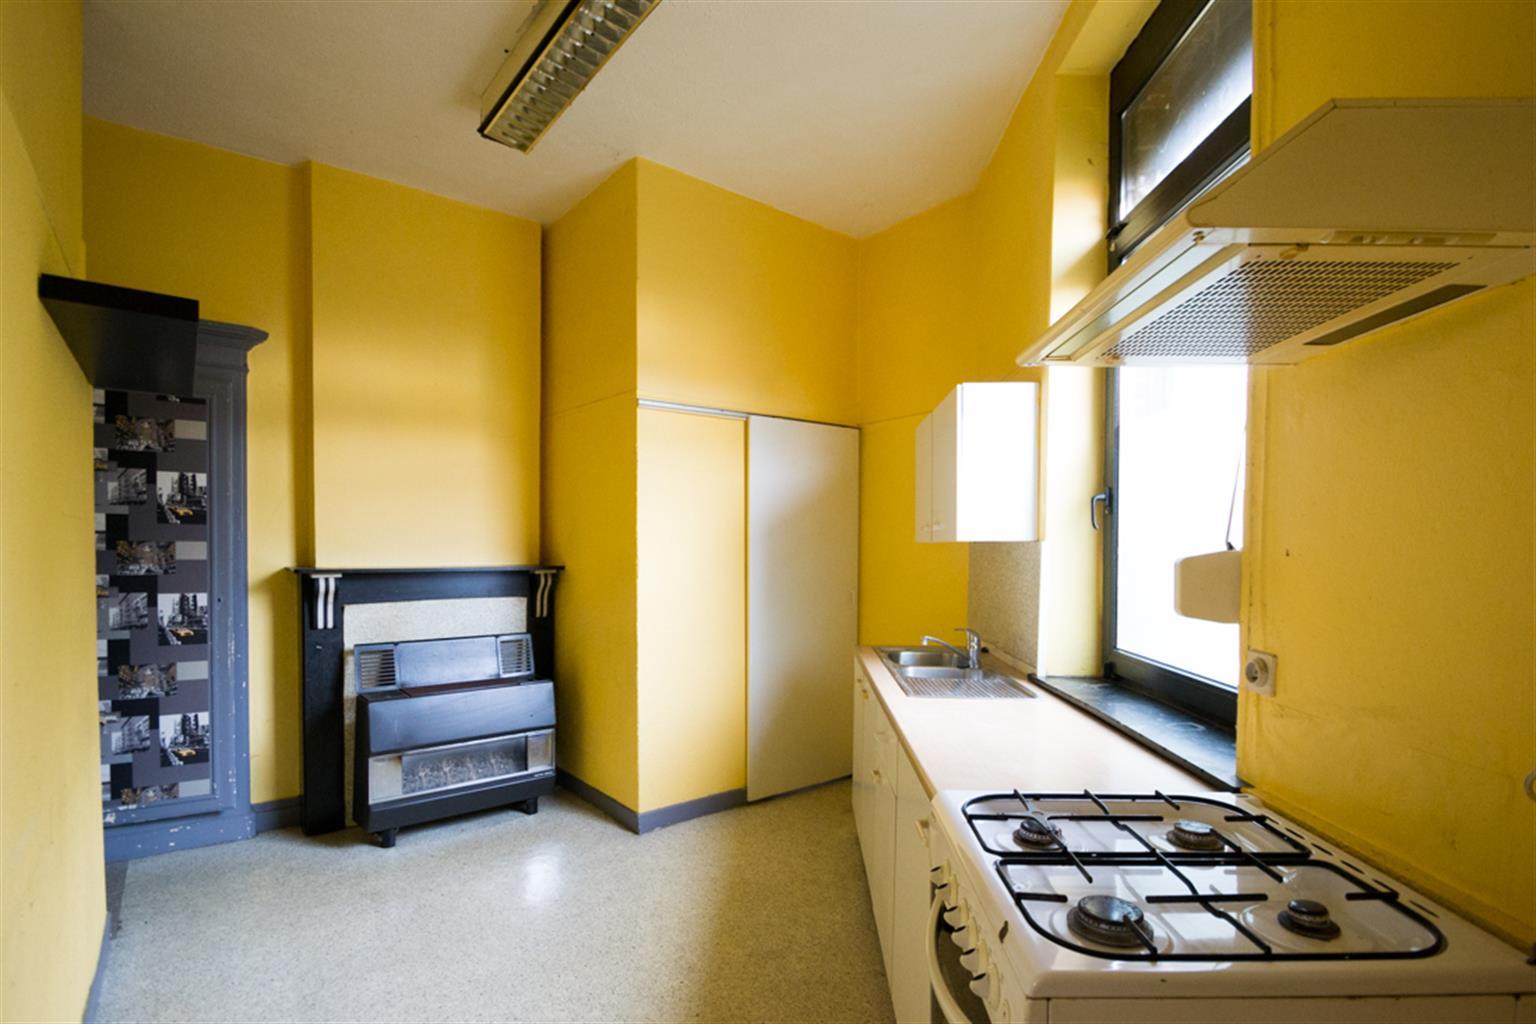 Maison - Charleroi Gosselies - #4286160-3